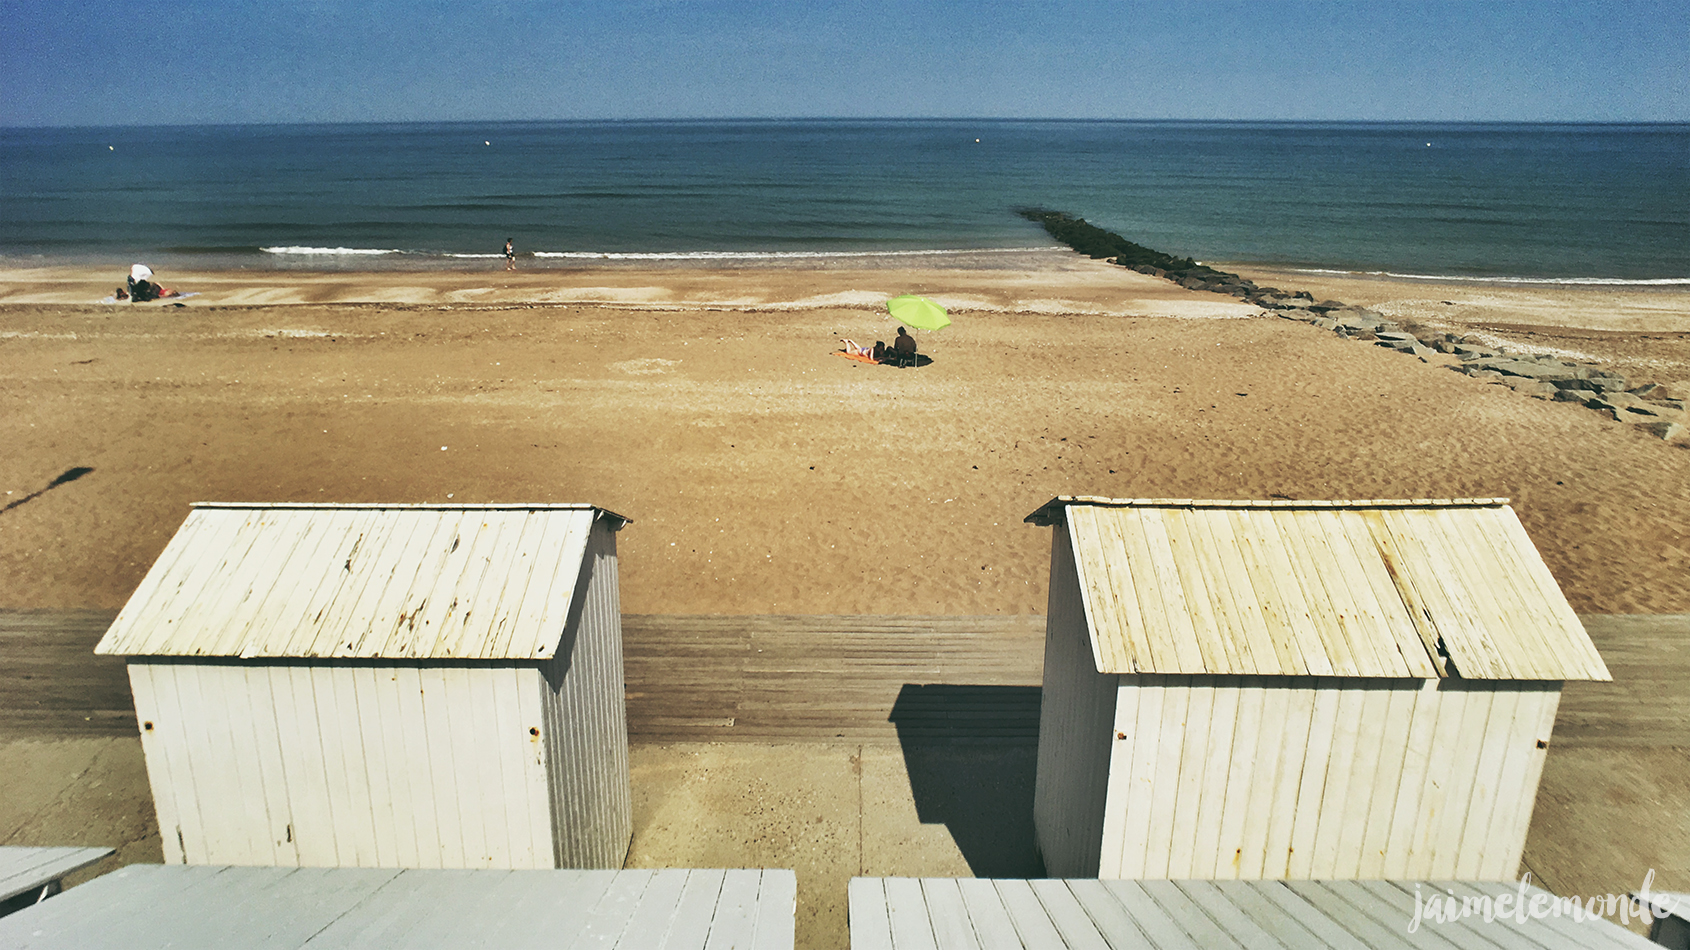 Pixter - Grand angle pro - Blonville sur mer - ©jaimelemonde (9)